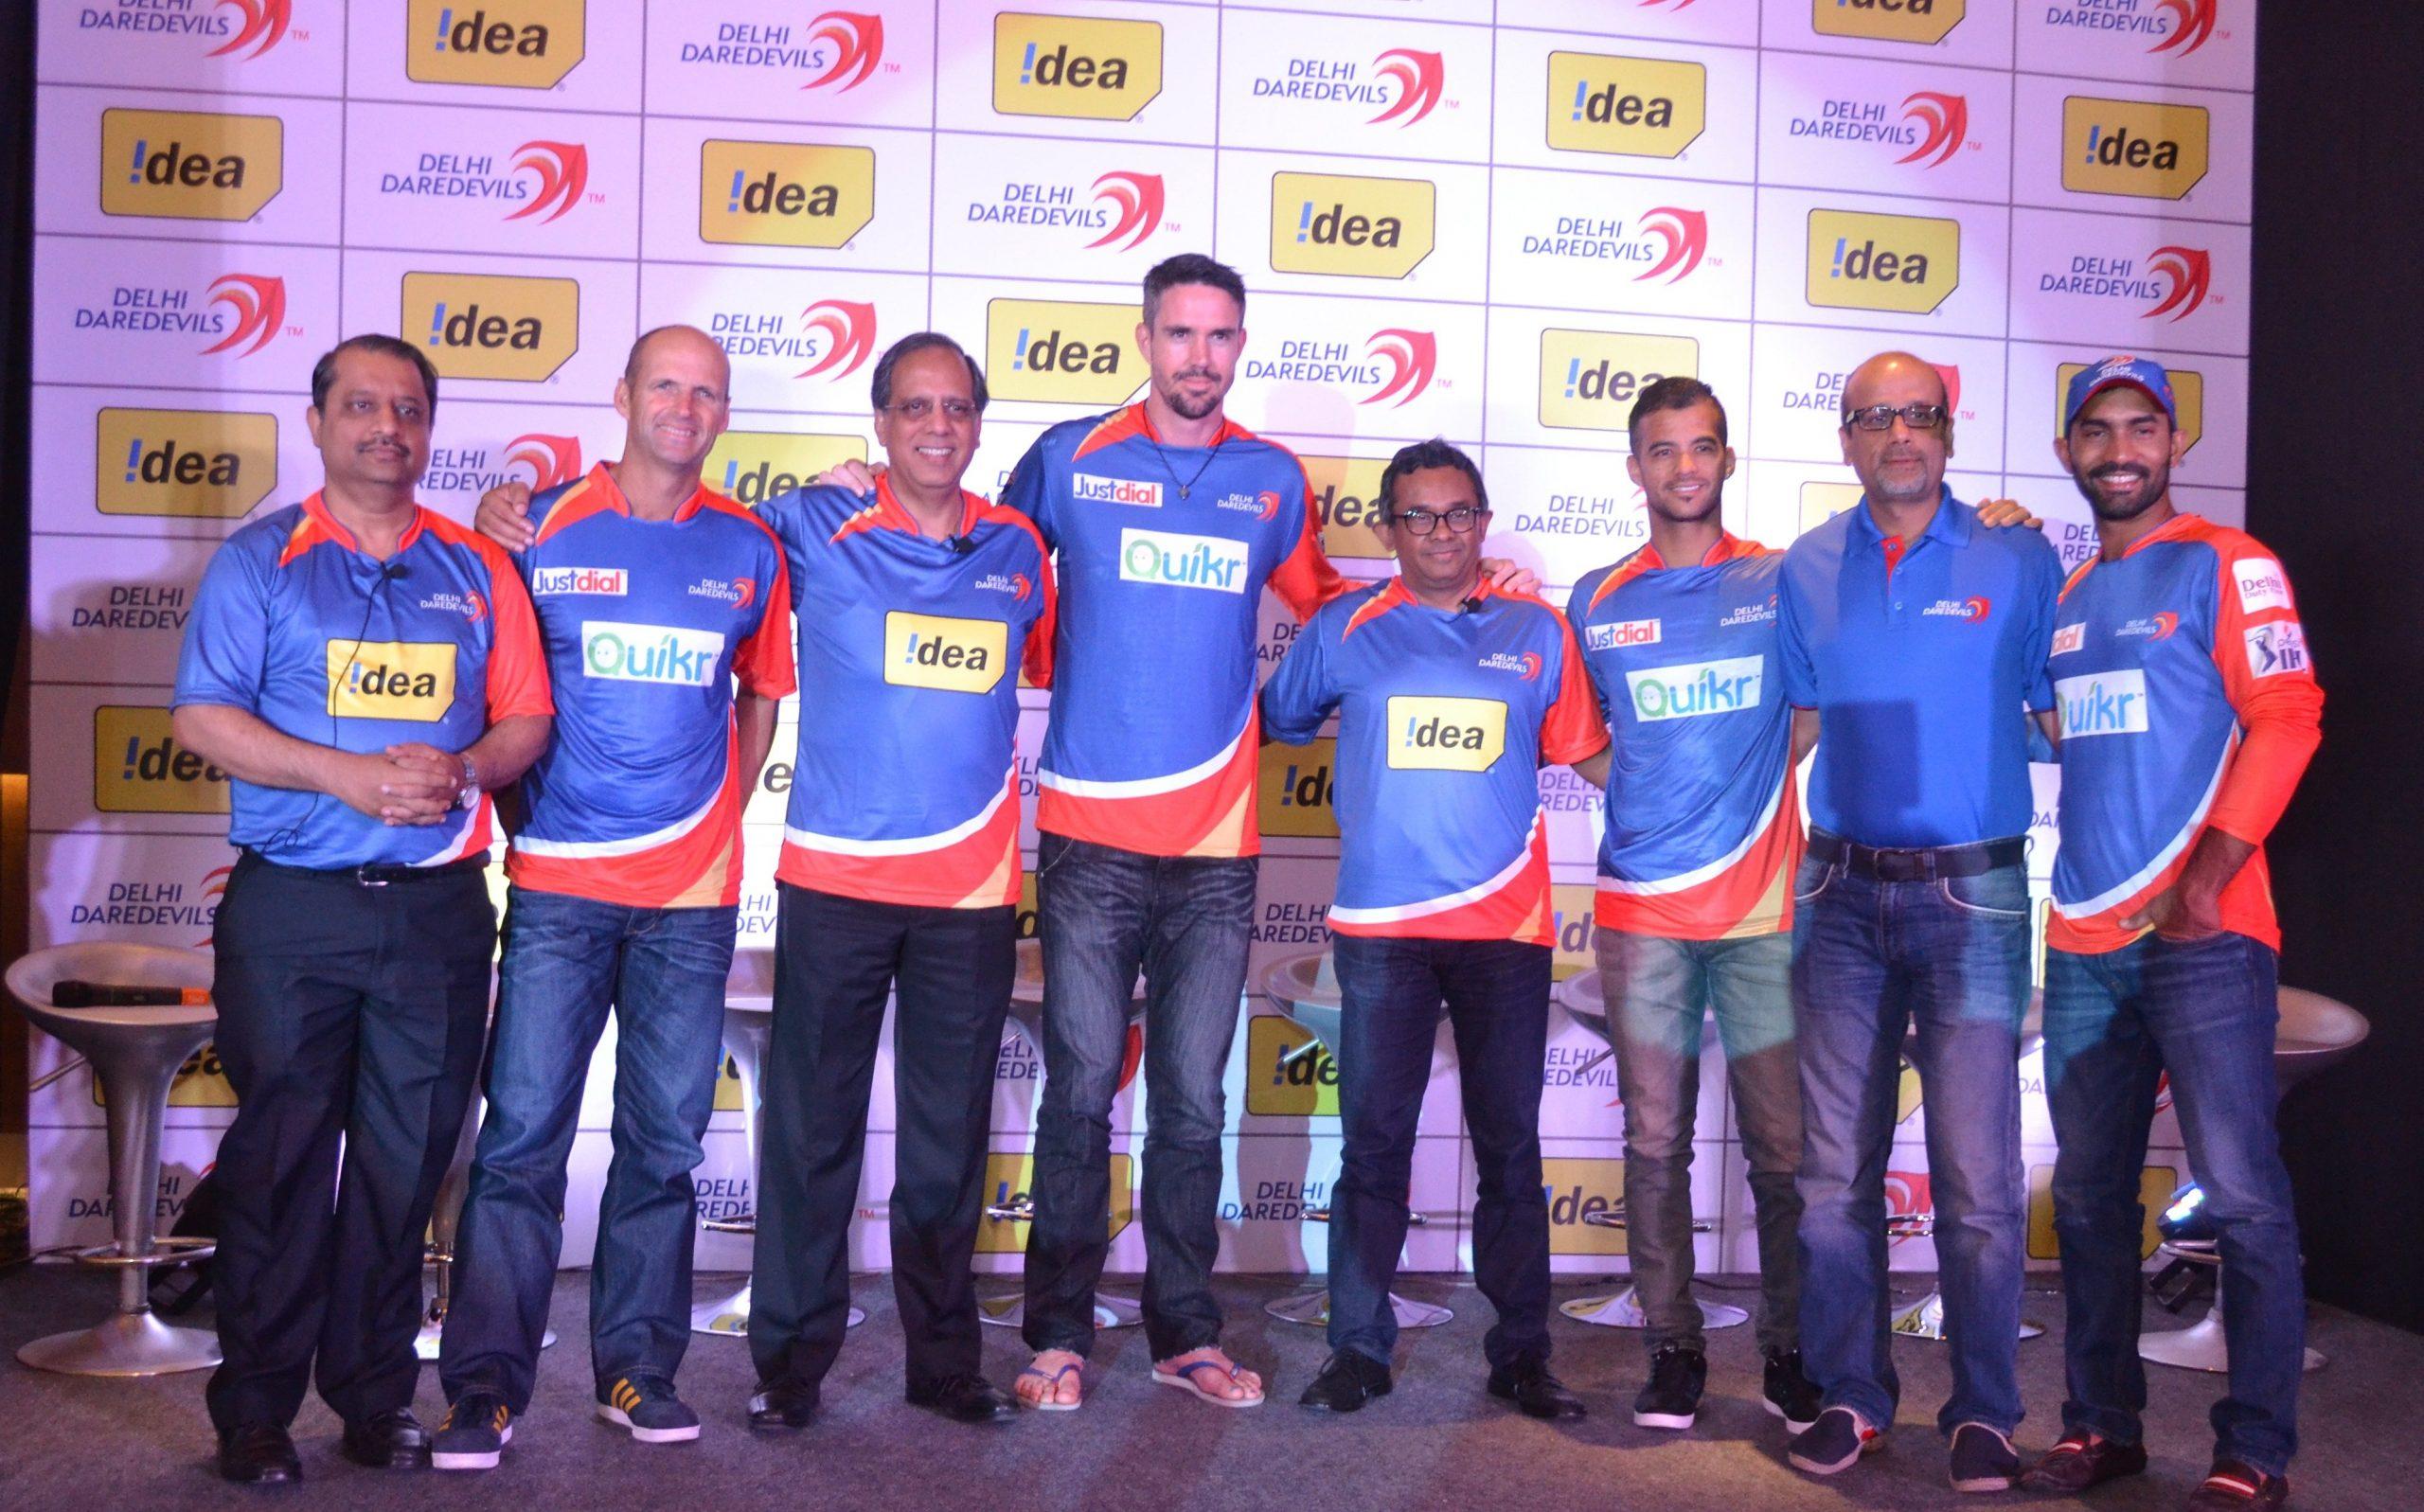 Sashi Shankar CMO Idea Cellular and Rajat Mukarji CCAO along with DD stars at the launch of Idea Delhi Daredevils Fan Page scaled